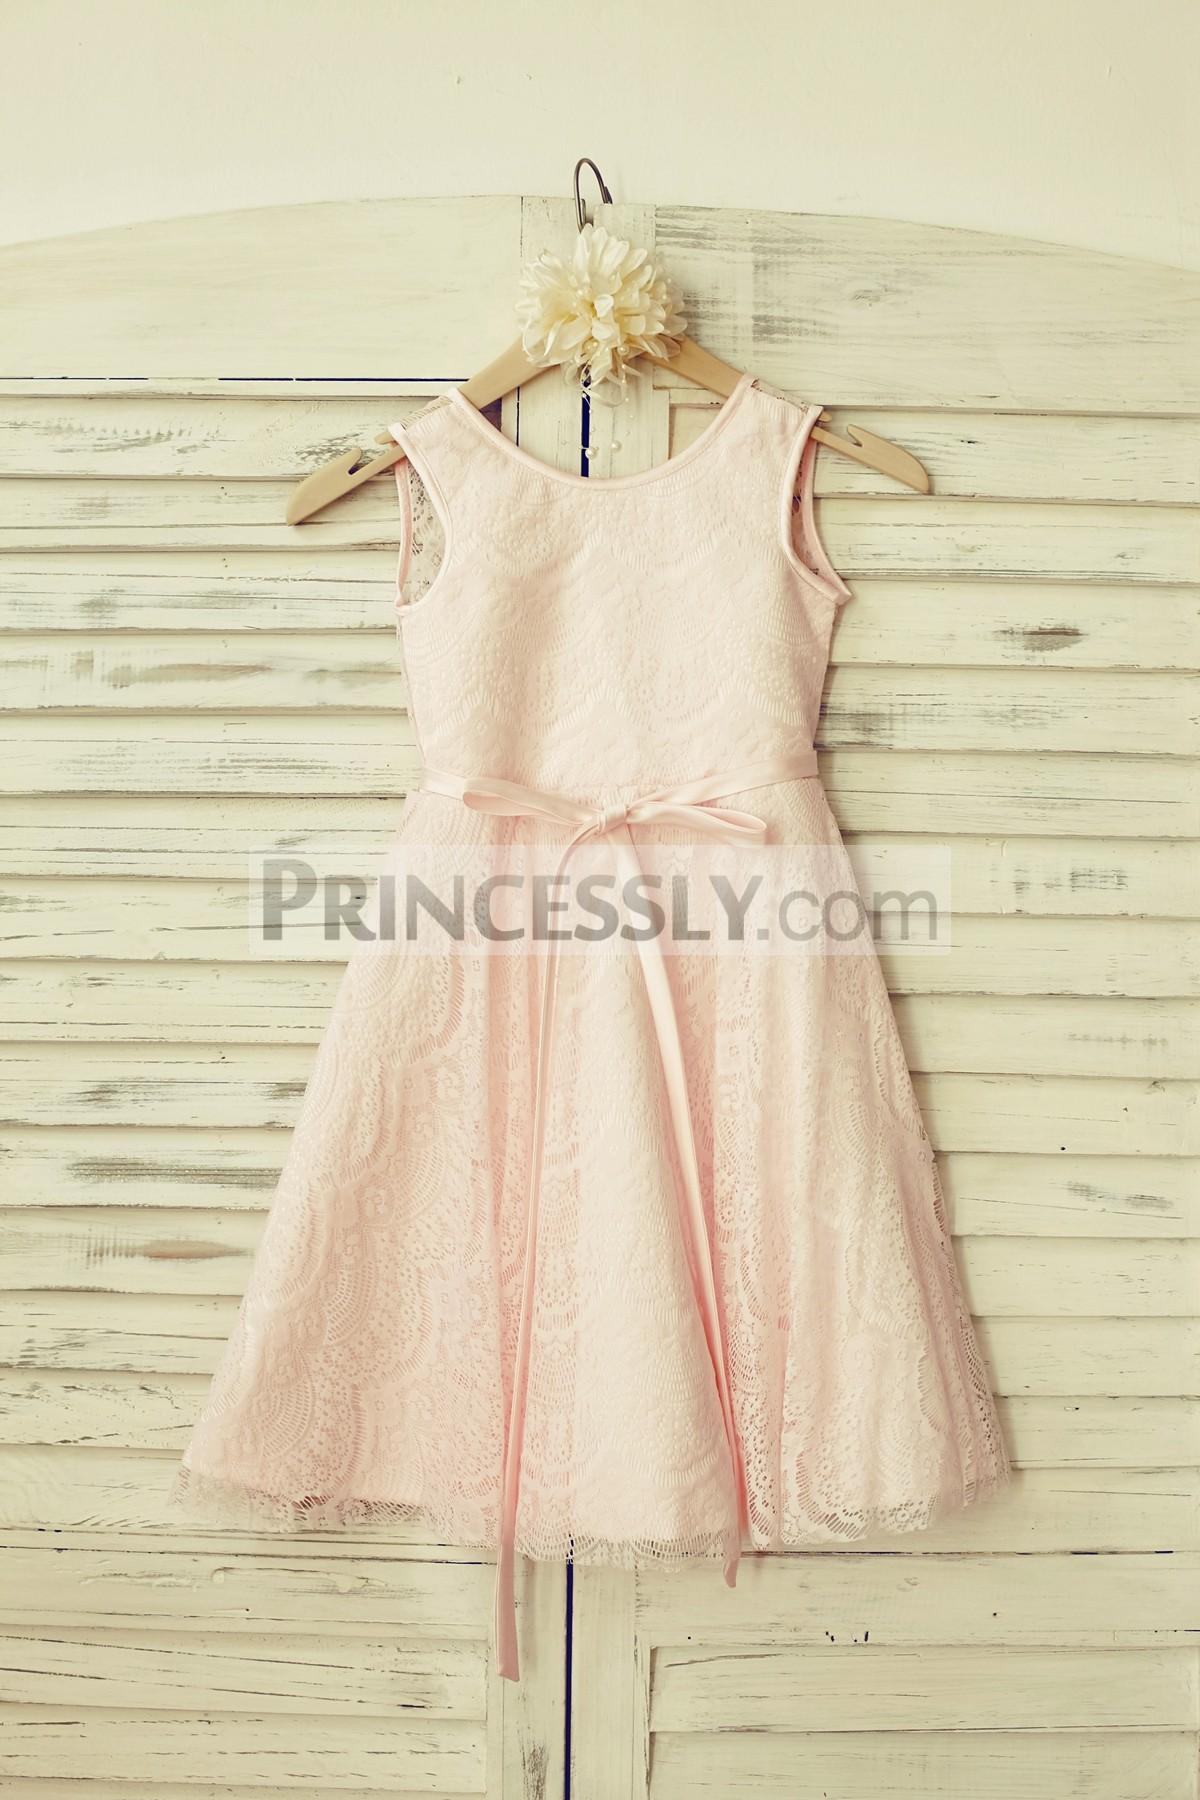 Princessly.com-K1000116-Blush Pink Lace V Back Flower Girl Dress with thin sash-31